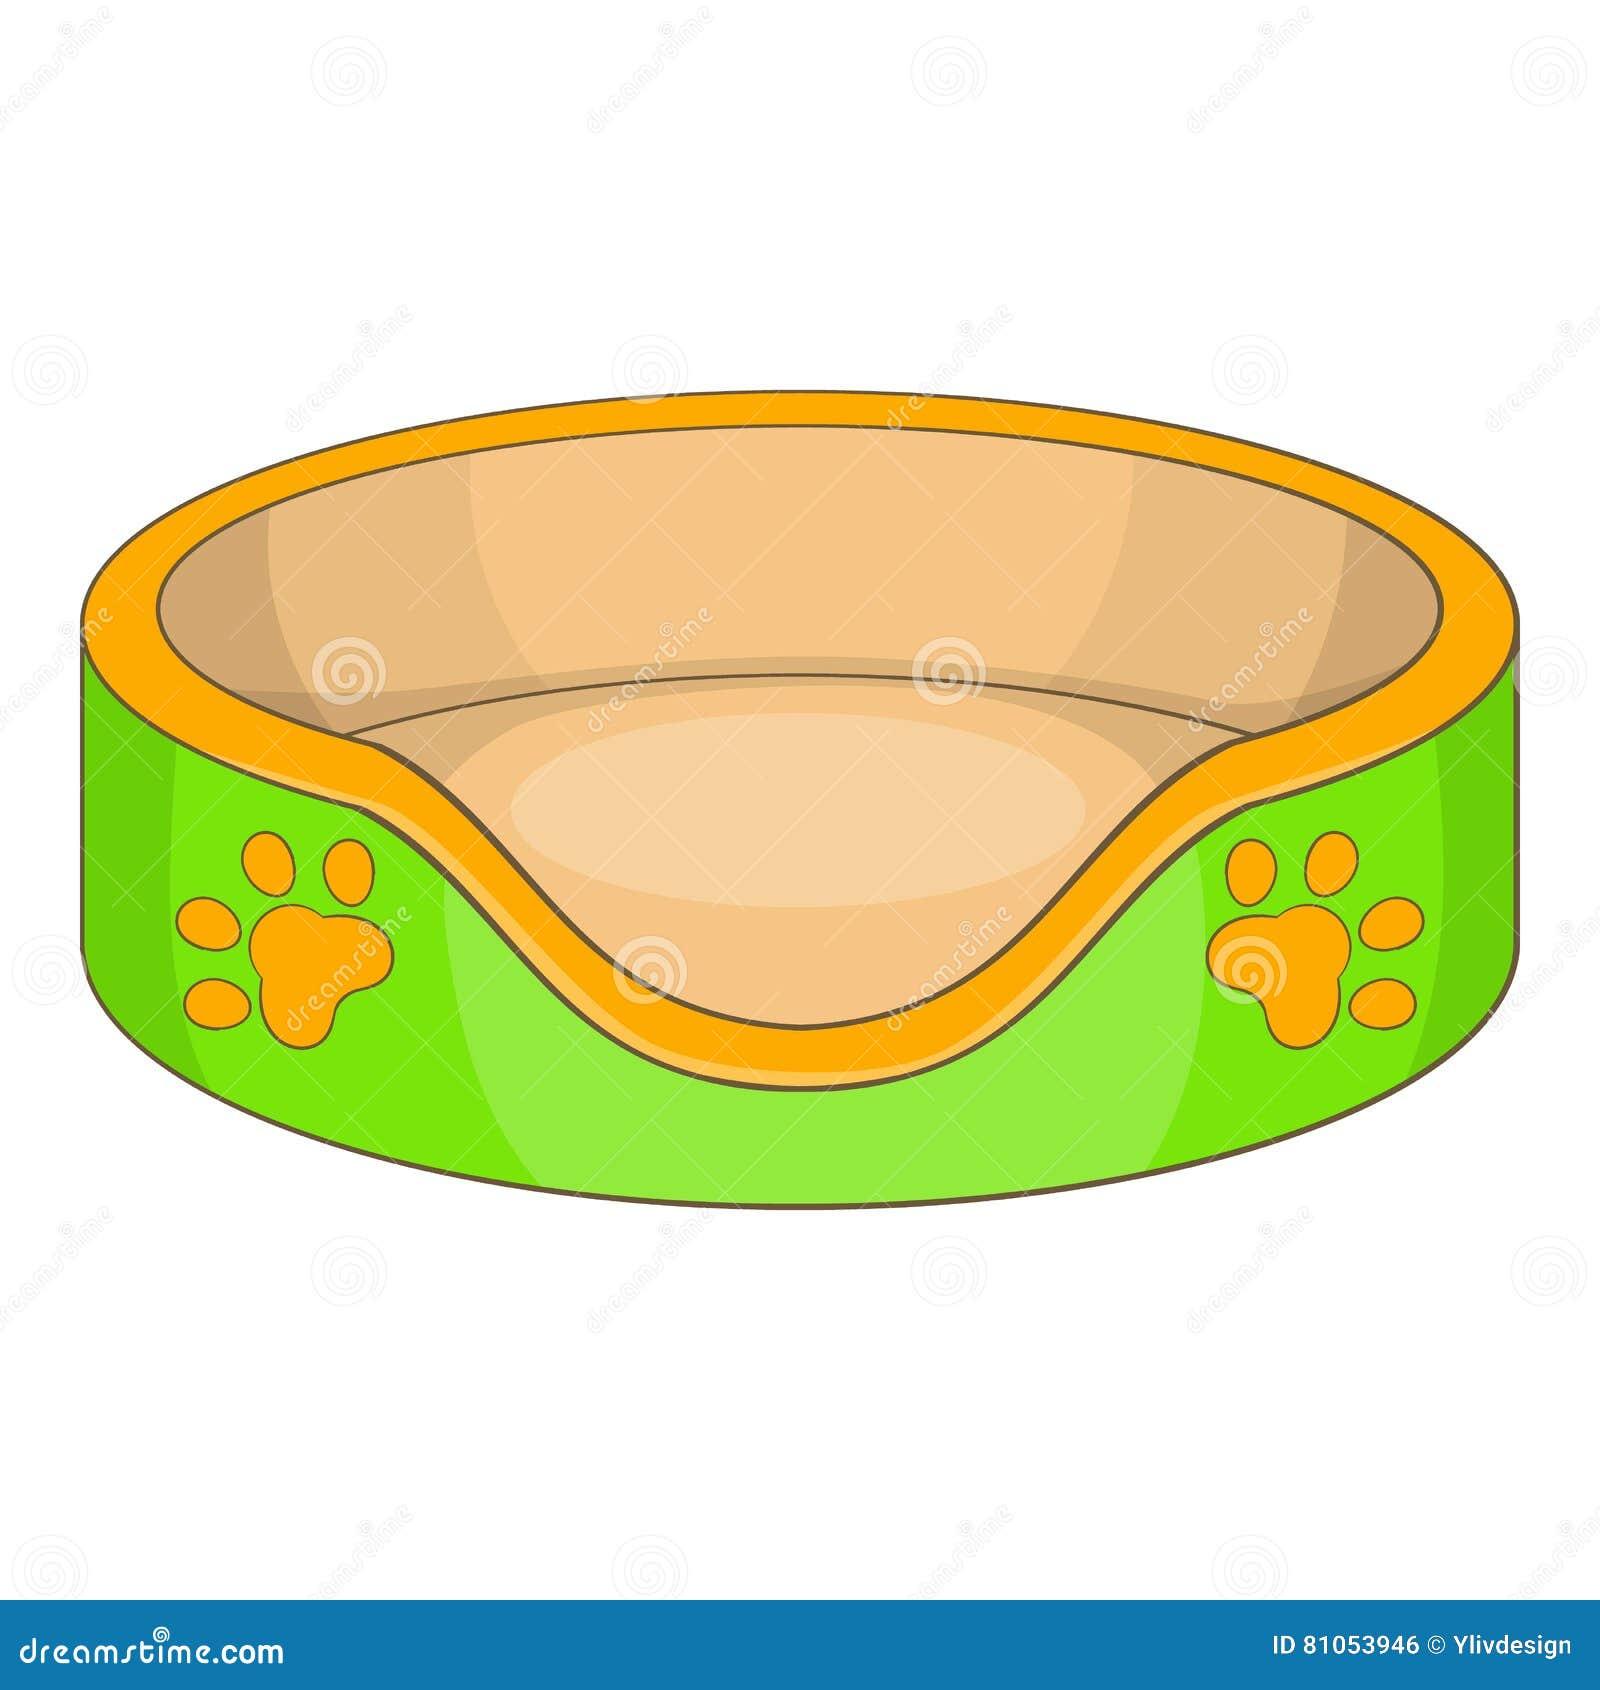 cat basket bed icon  cartoon style stock vector image cartoon dog silhouette clip art cartoon dog faces clipart